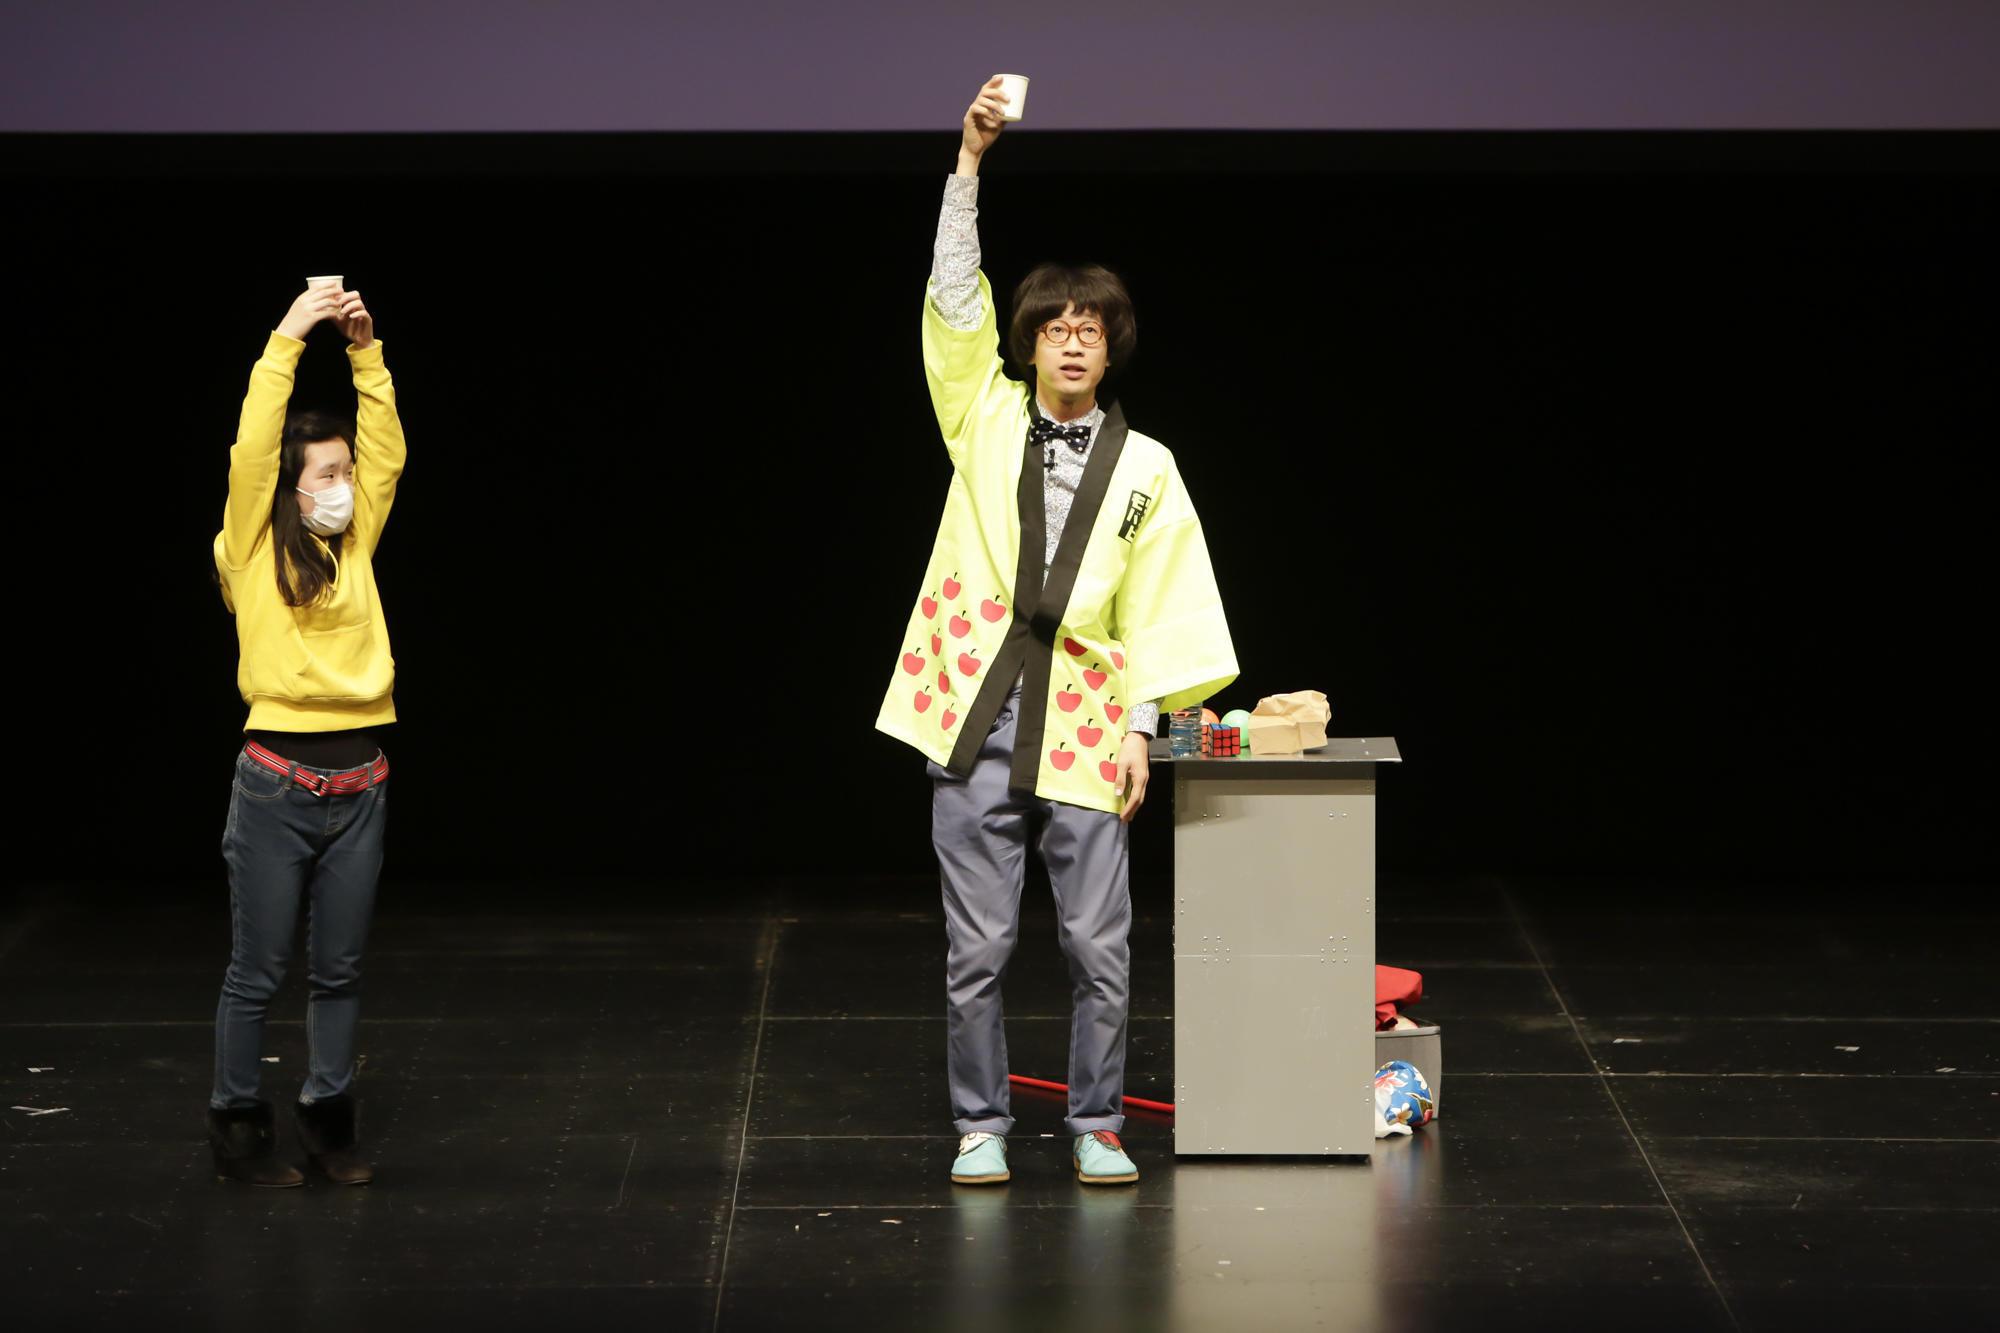 http://news.yoshimoto.co.jp/20190128143507-e0a1018bed9f3a6155cf8a7fae451779e73fe0a0.jpg